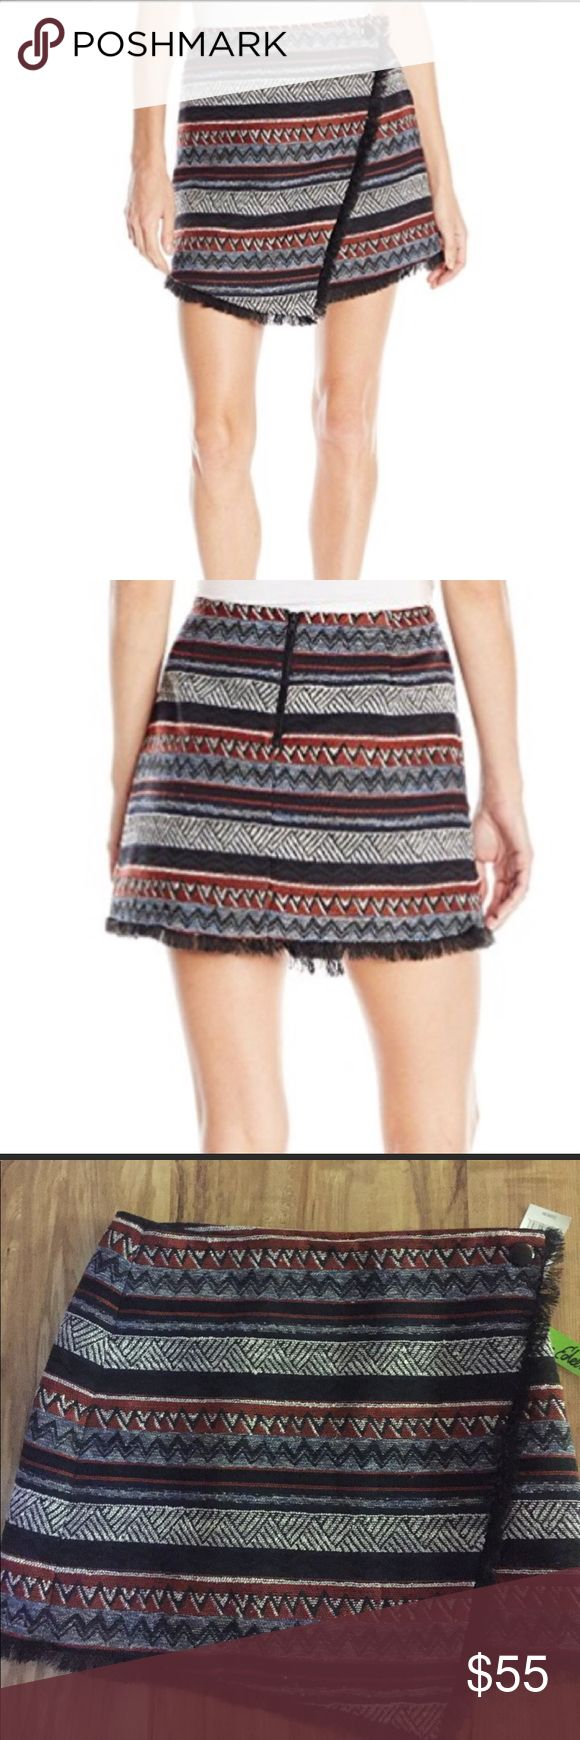 Sam Edelman Skirt Sam Edelman Aztec print skirt size 8 Sam Edelman Skirts